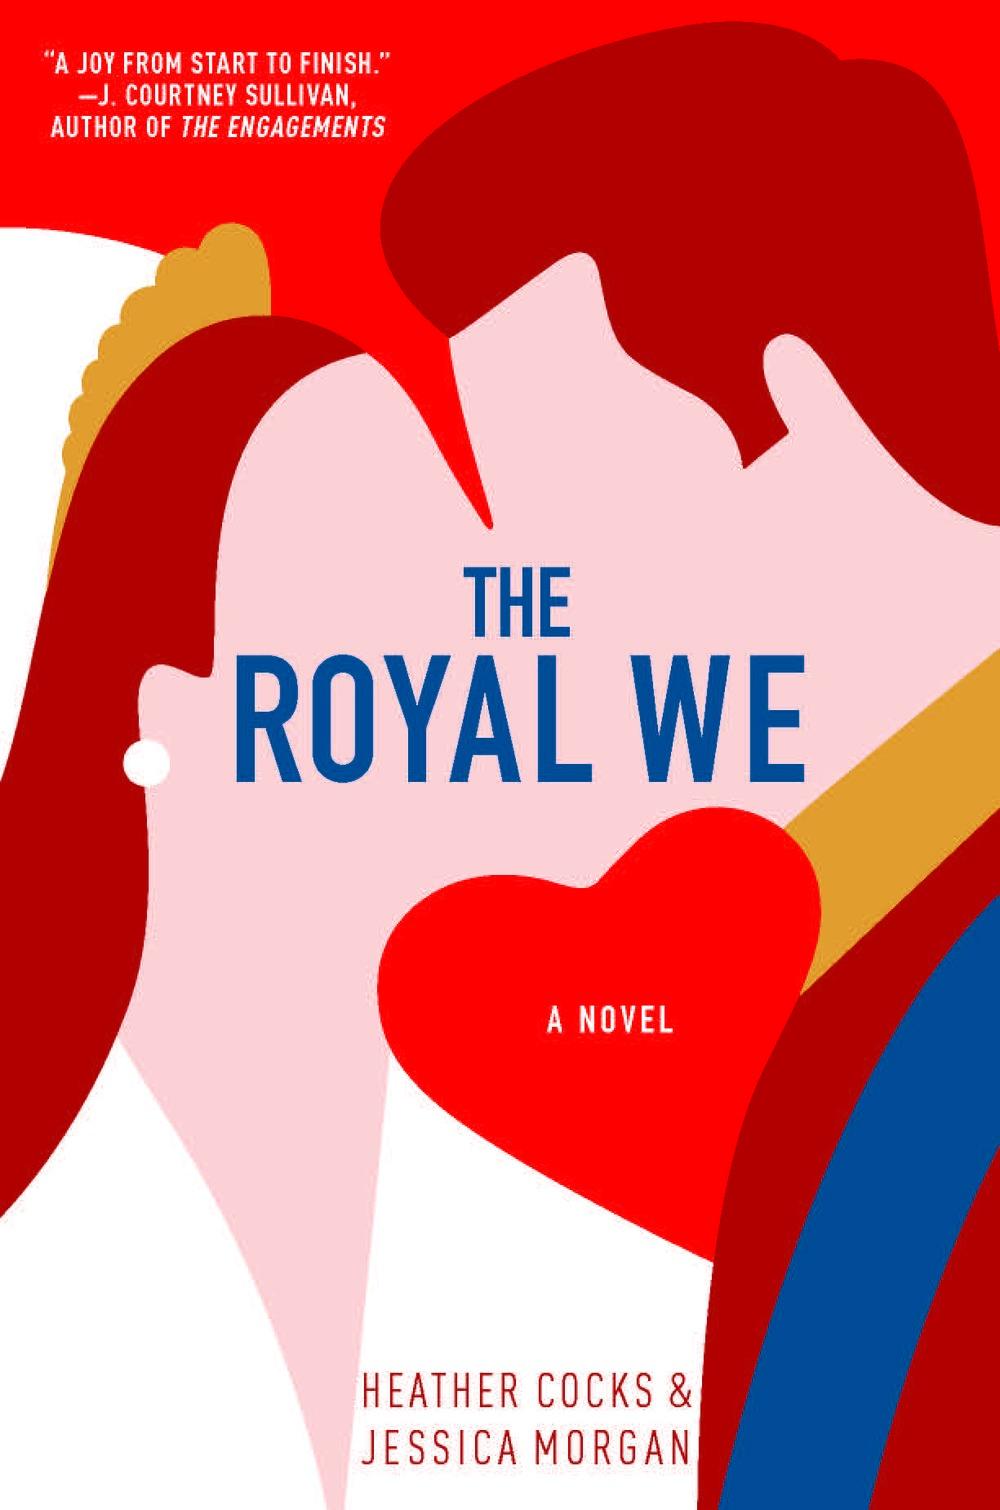 The Royal We | ashleyjoanna.com